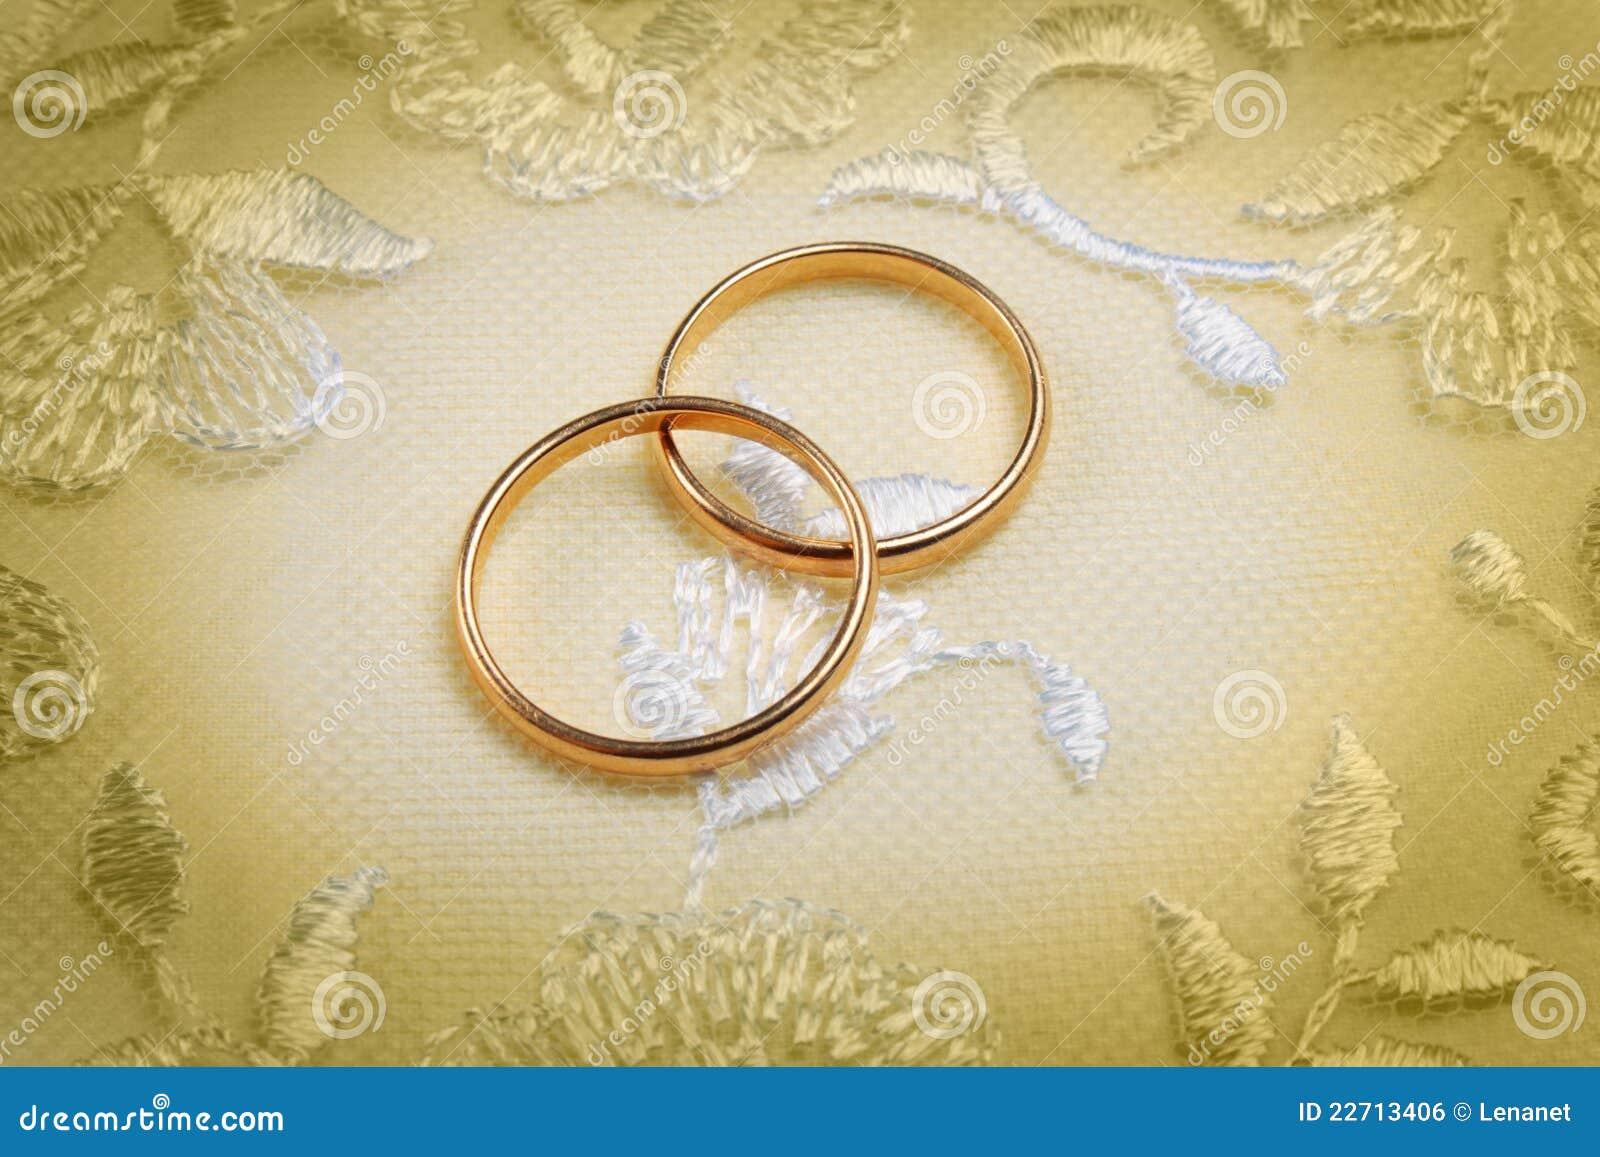 wedding rings royalty free stock image image 22713406